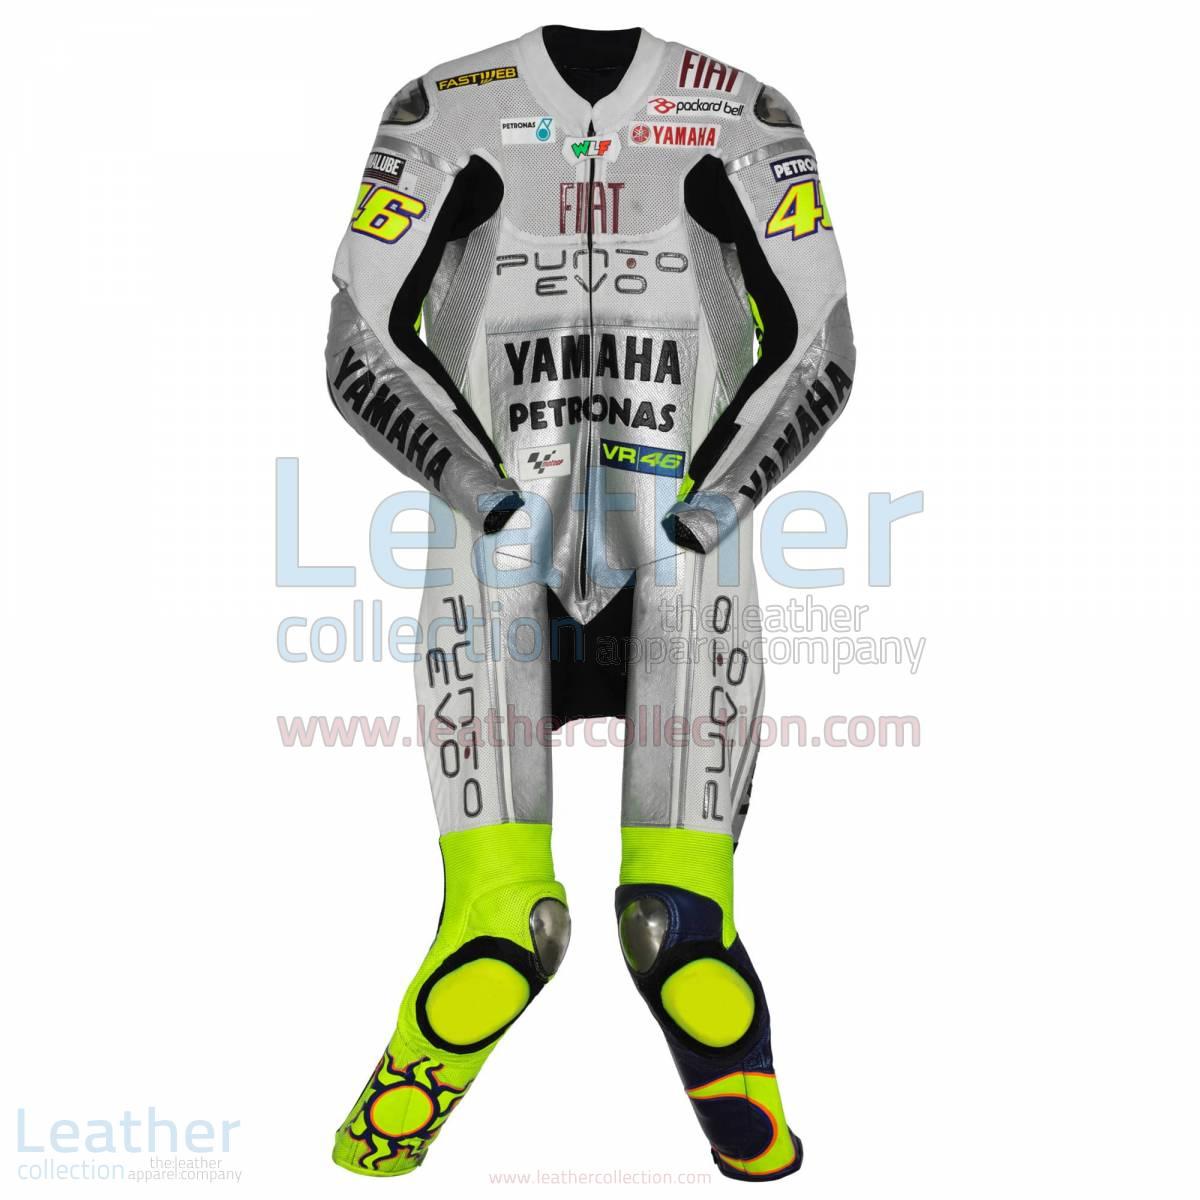 Valentino Rossi Yamaha Fiat 2009 Racing Suit